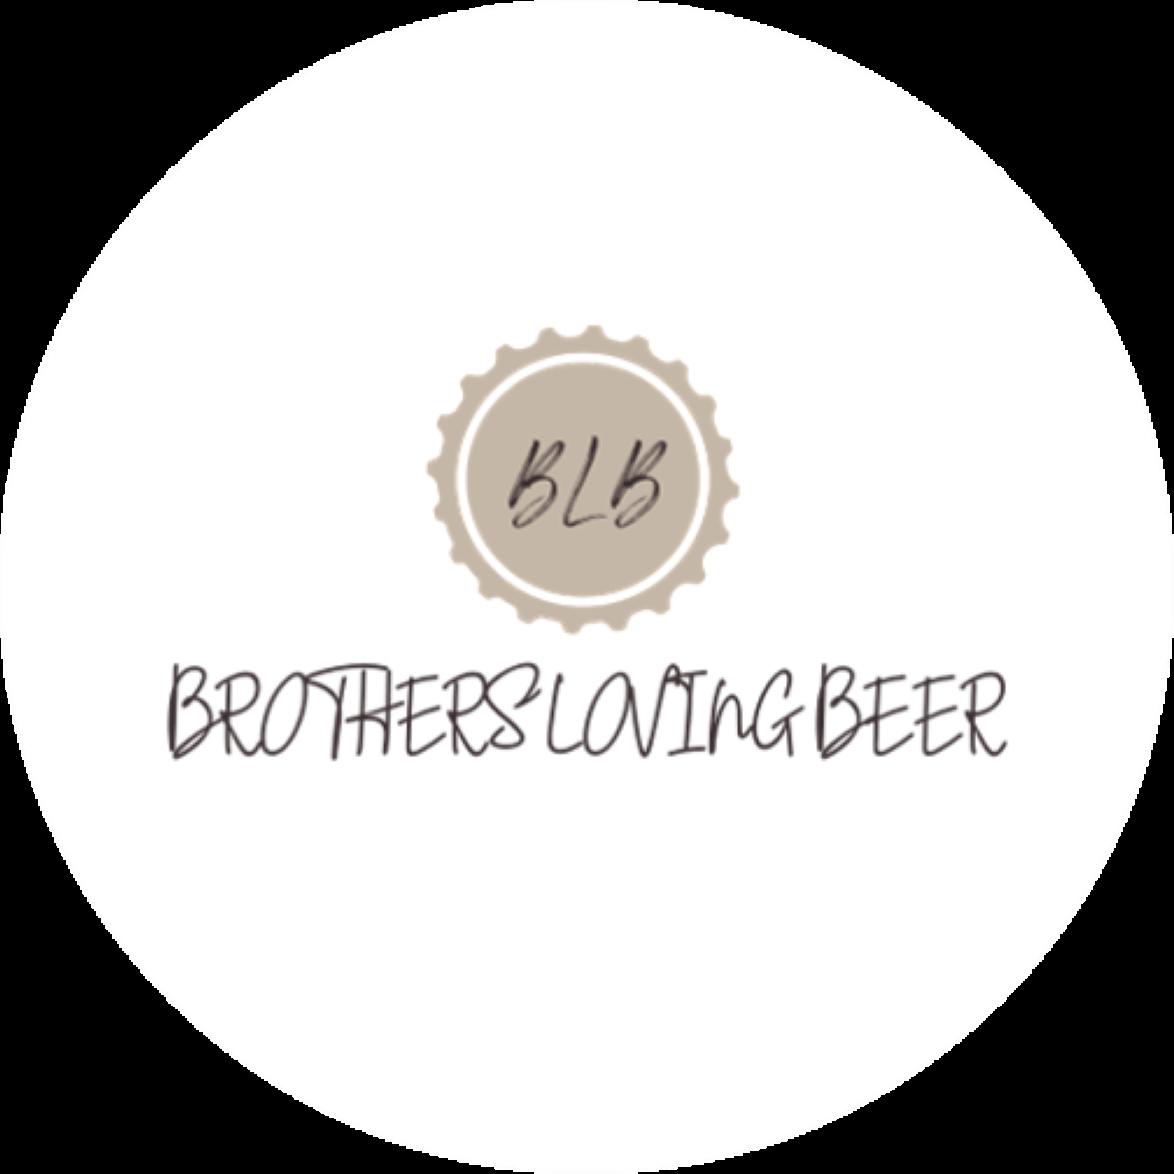 Brothers Loving Beer craft beer marketplace